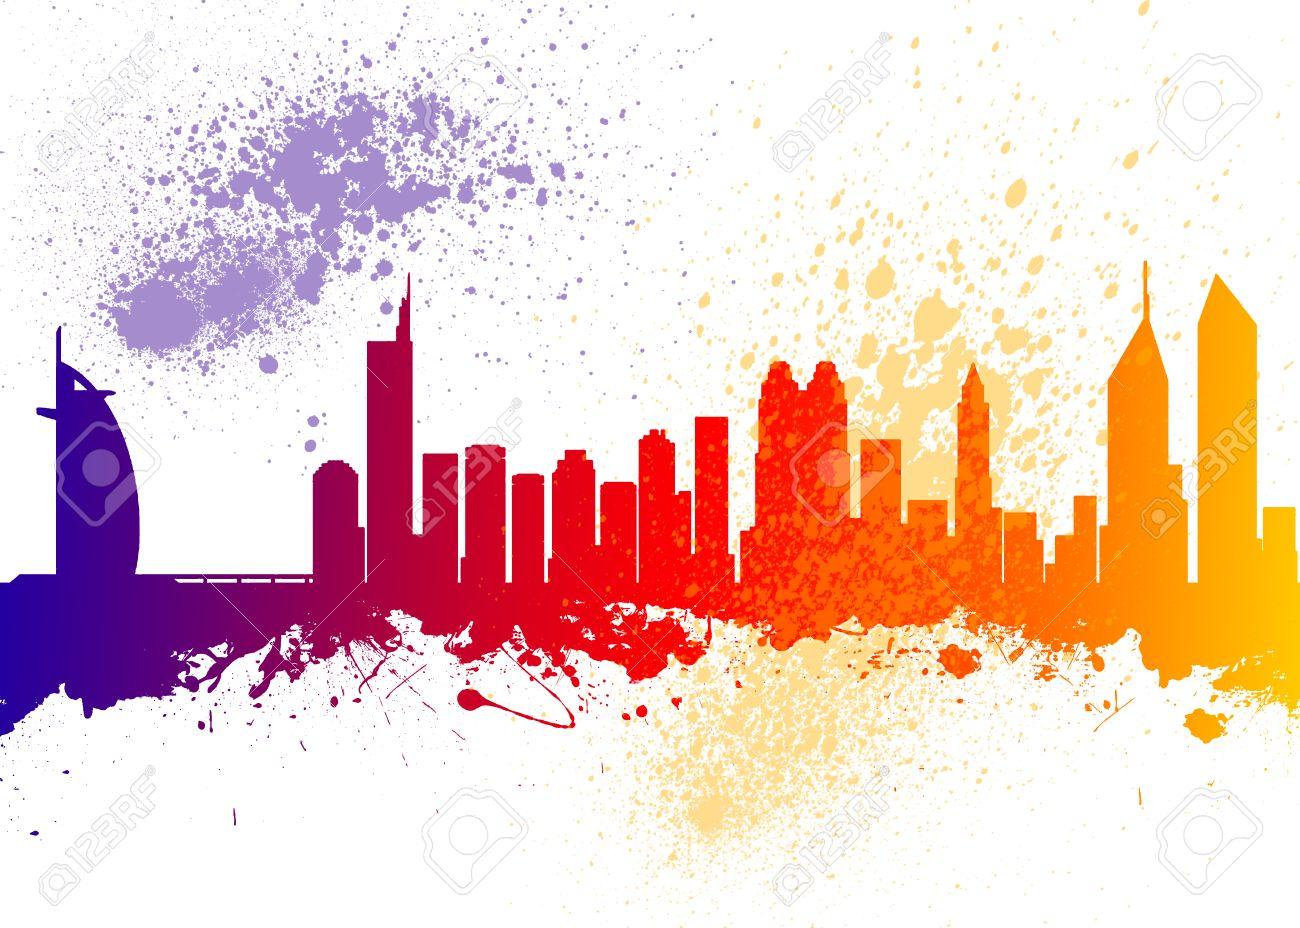 Color art dubai - Watercolor Art Print Of The Skyline Of Dubai Stock Photo 37230981